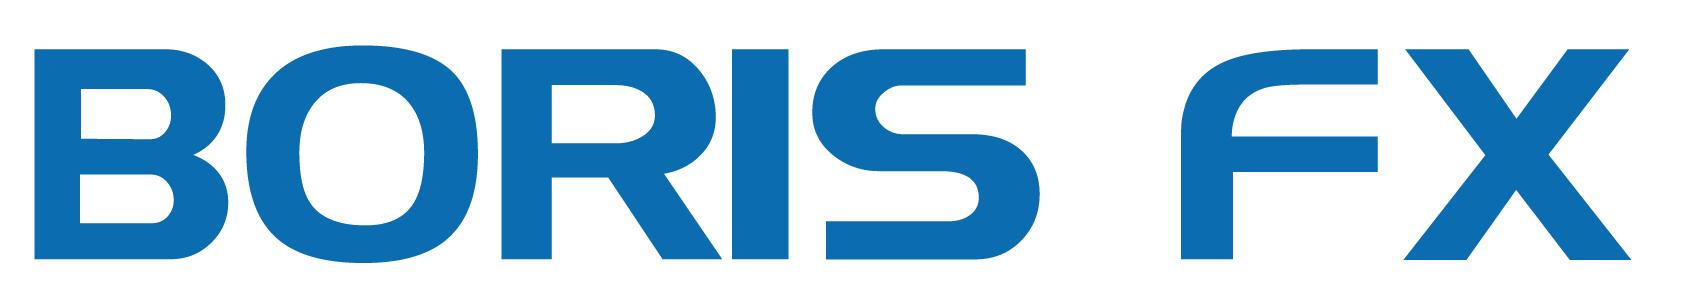 borisfx_logo